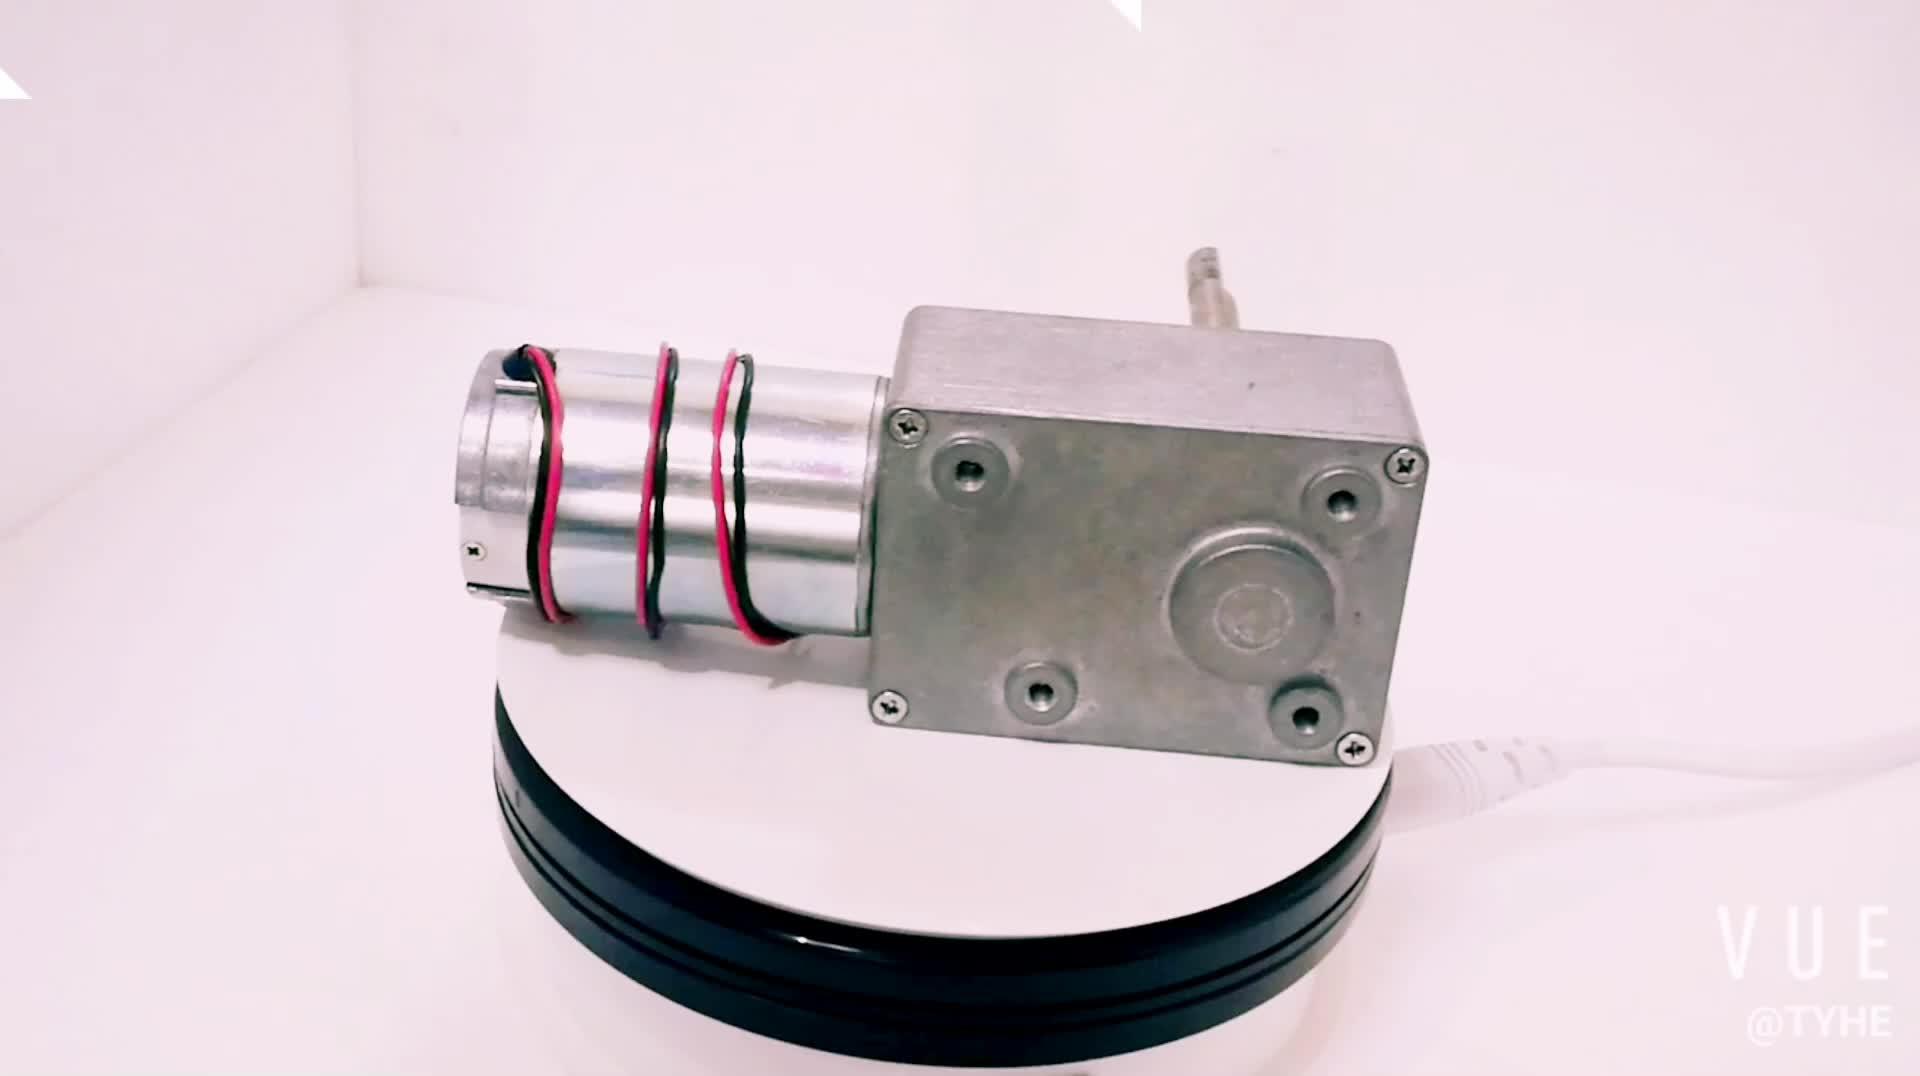 Factory Goods 58*83 Size 12 Volt 12v 24v 150w 200w 200rpm High Torque Dc  Worm Gear Motor For Wheelchair - Buy 24v 12 Volt High Torque Worm Gear  Motor